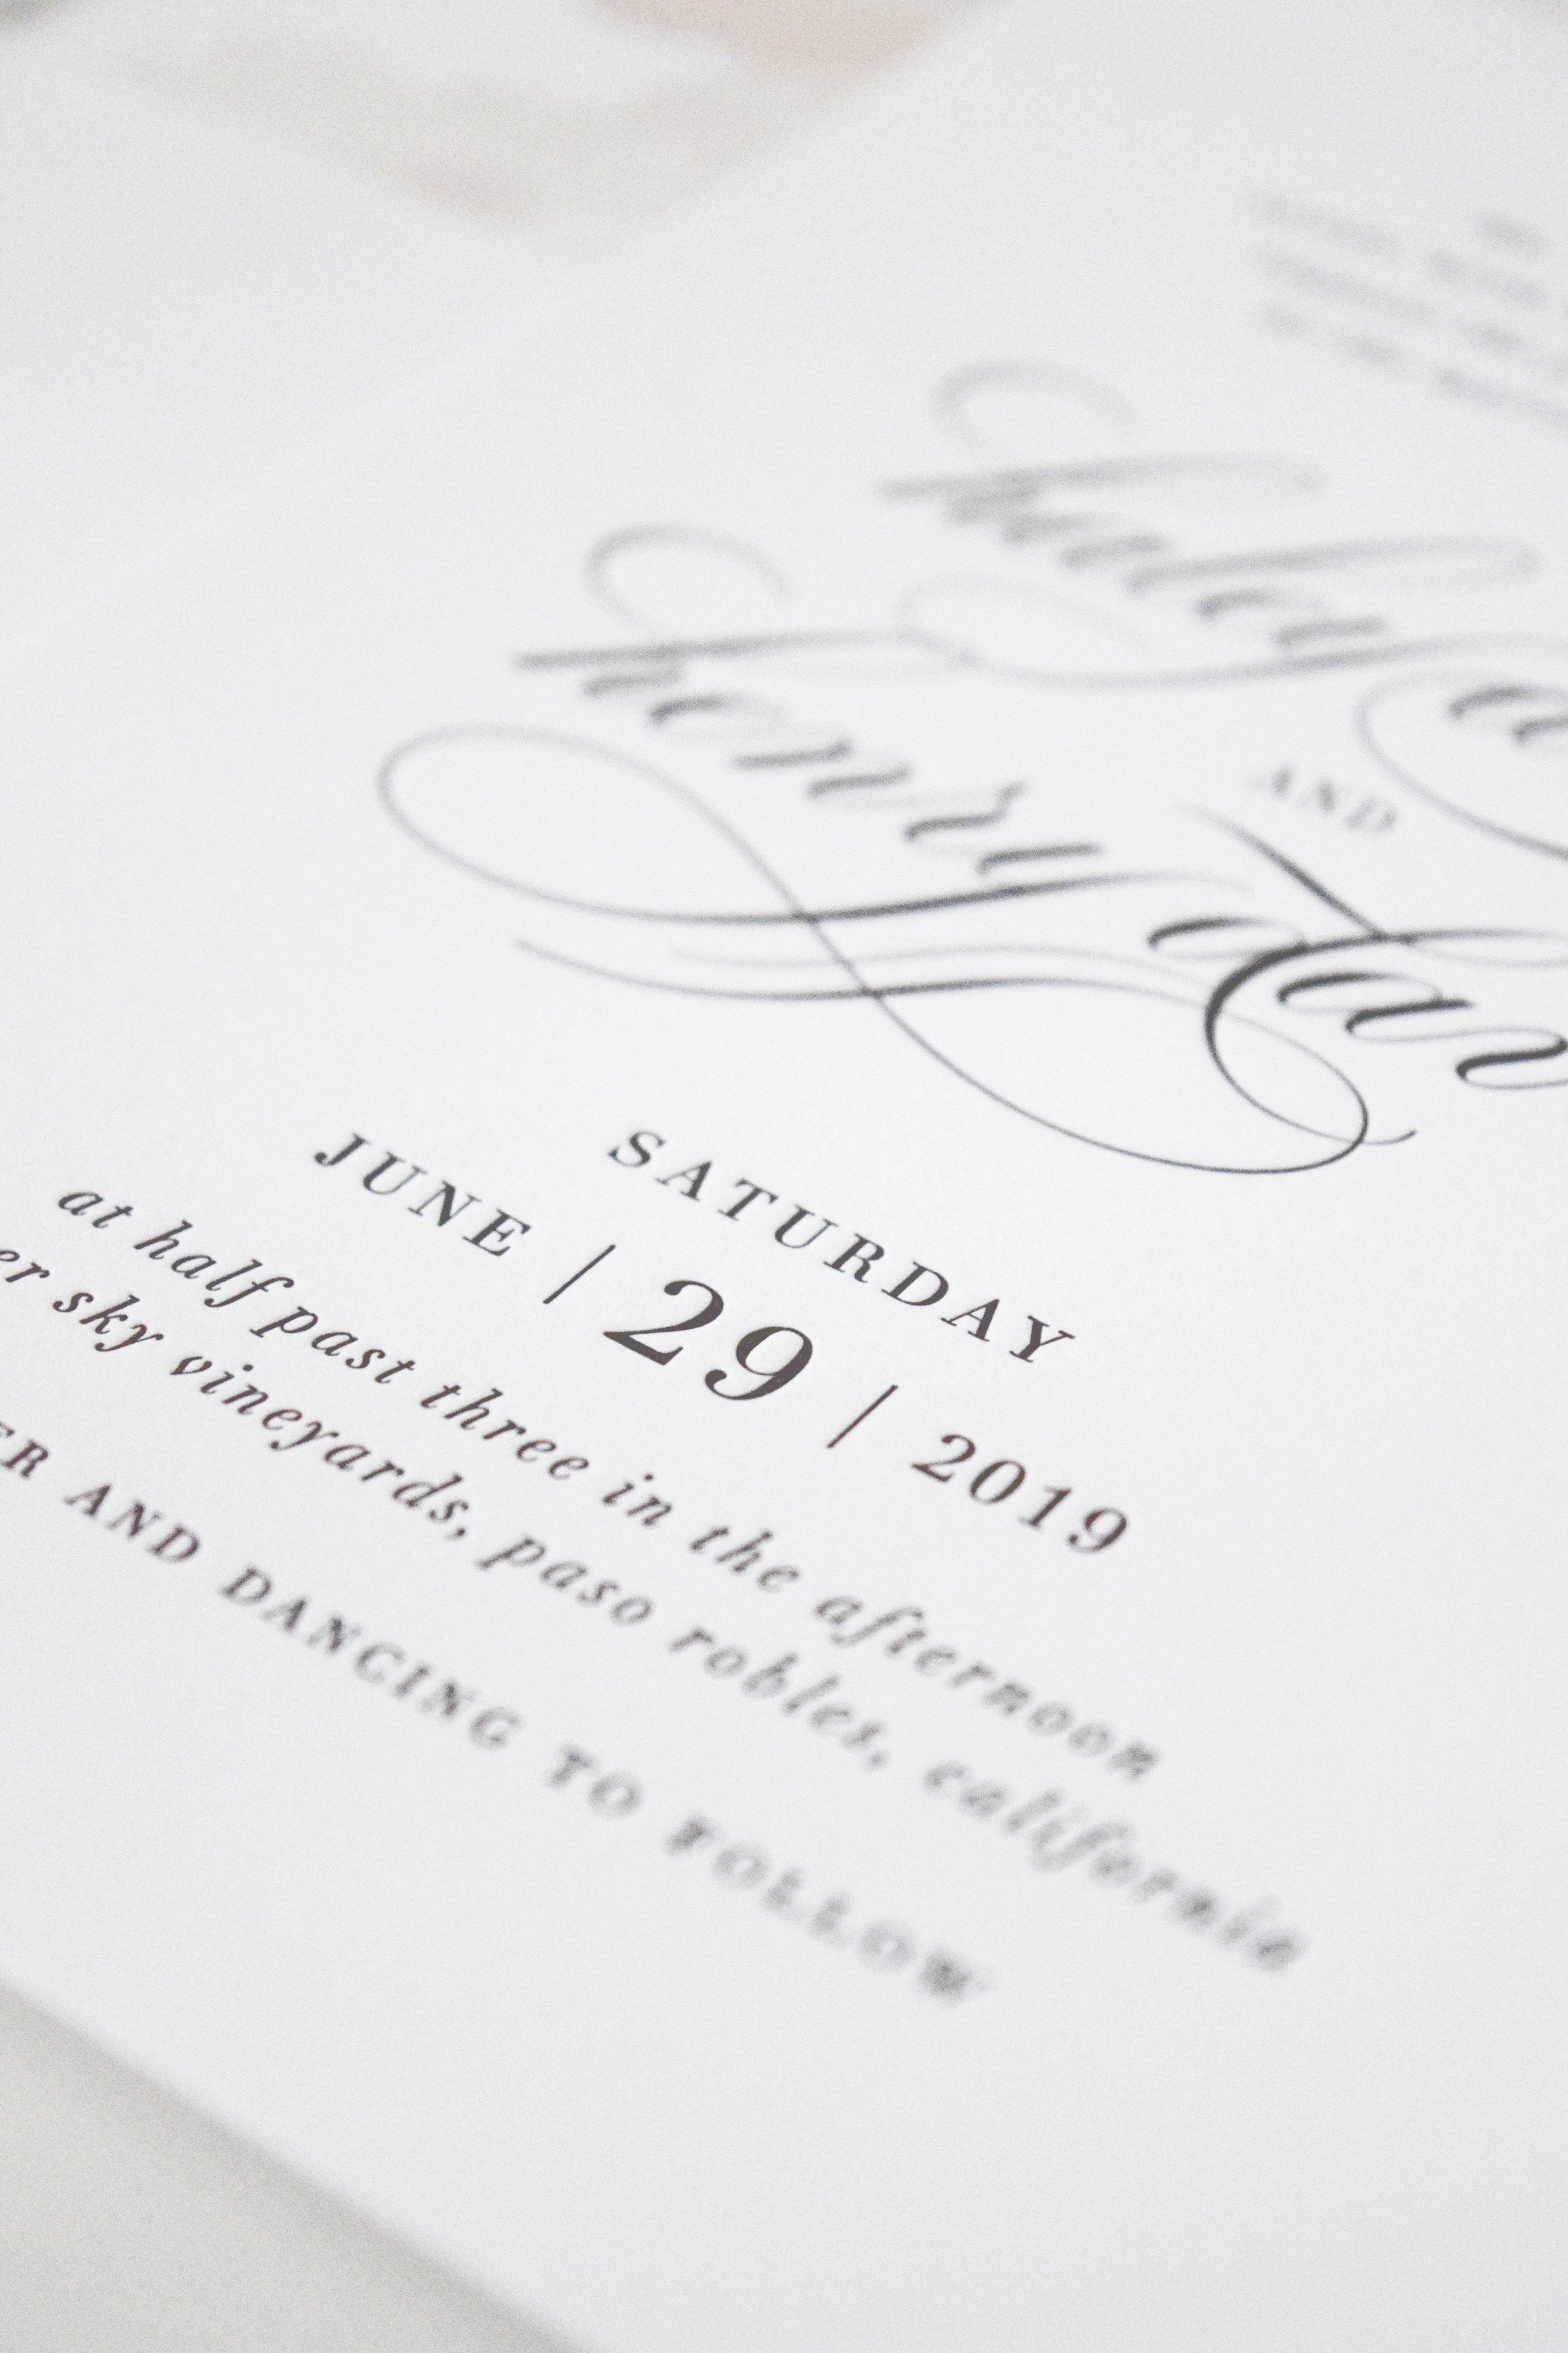 White + Blush Wedding Invitations - Shine Wedding Invitations